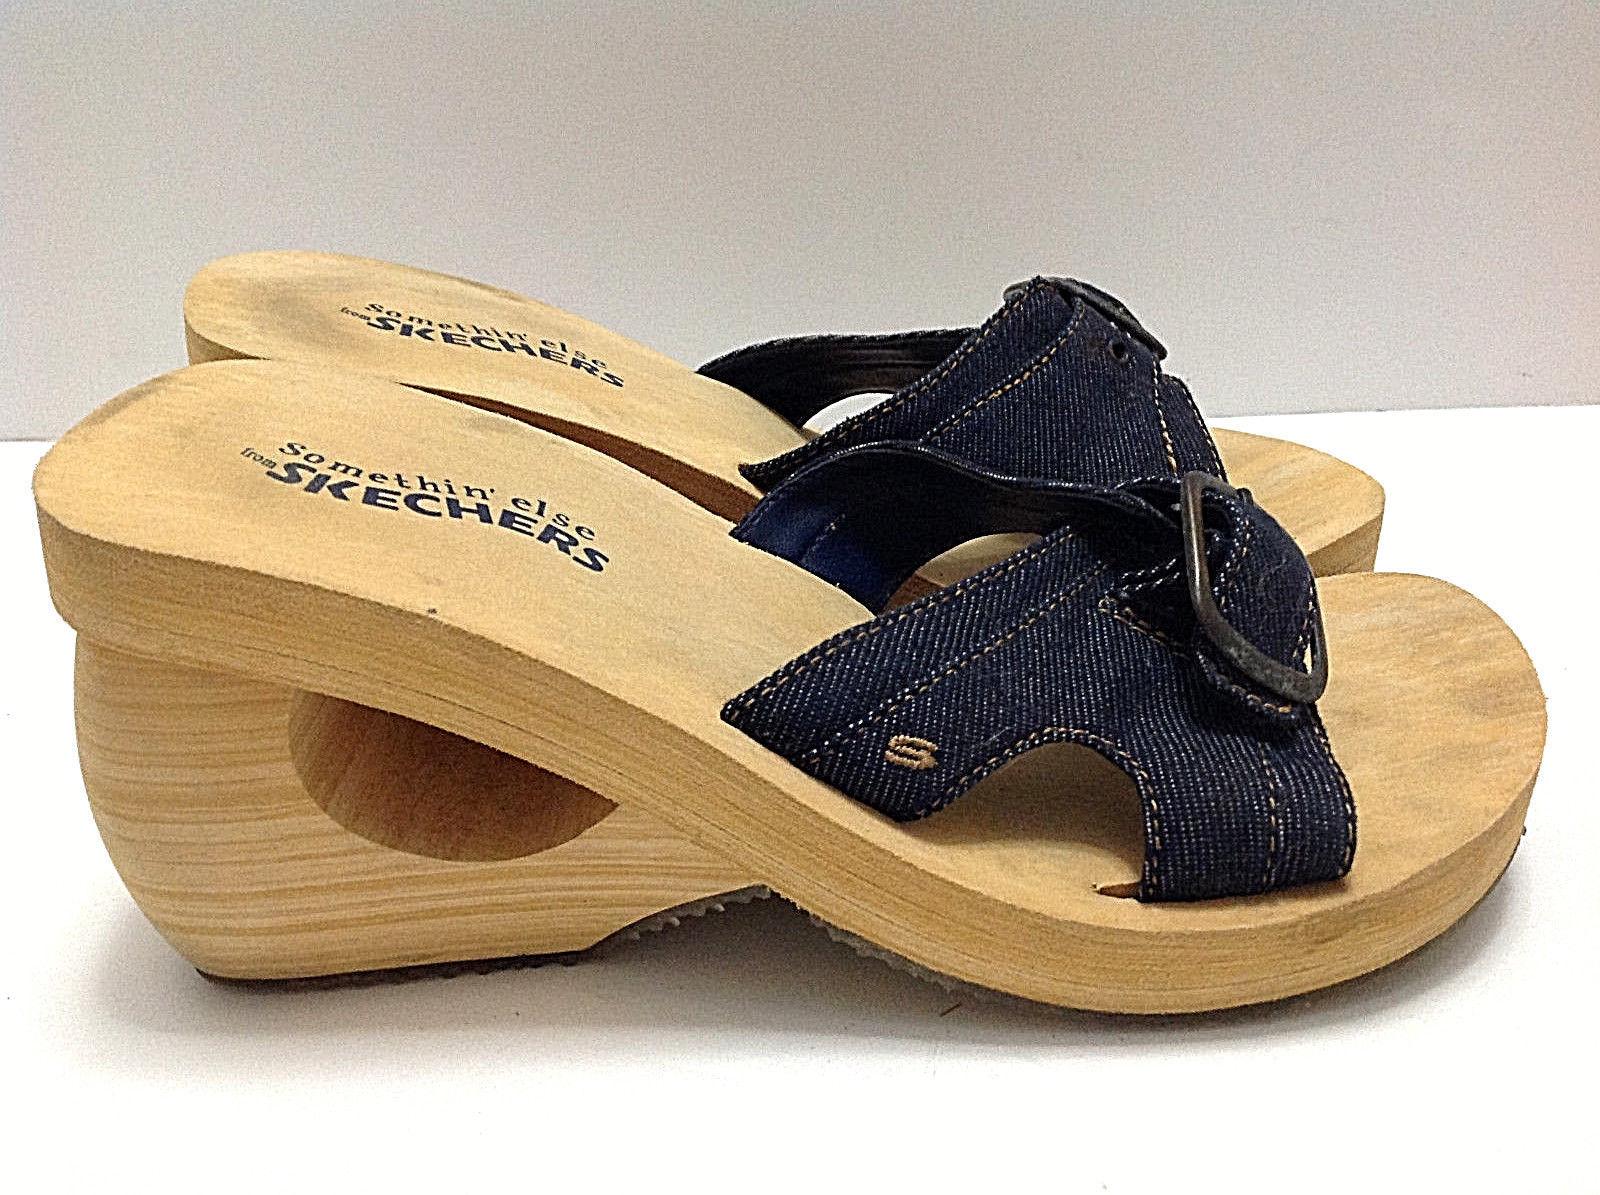 51a3d09d4585 ... Skechers Something Else Women s Wedge Sandal Blue Denim With Buckle  Size ...